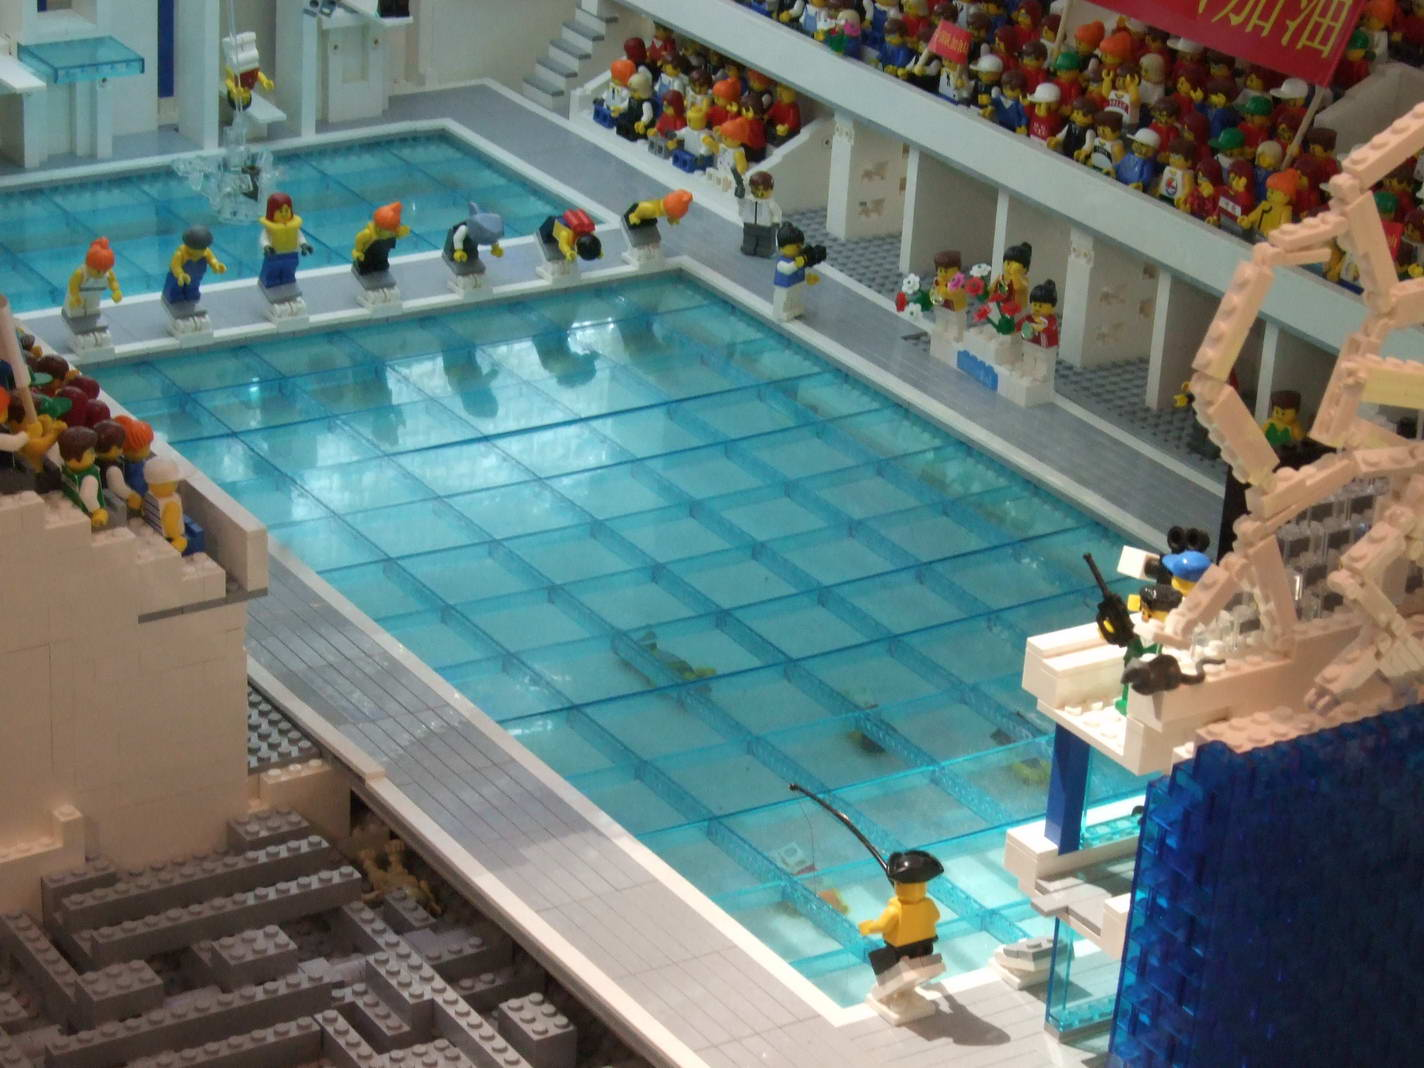 Spotlight beijing architecture lego for Garden design jobs nyc